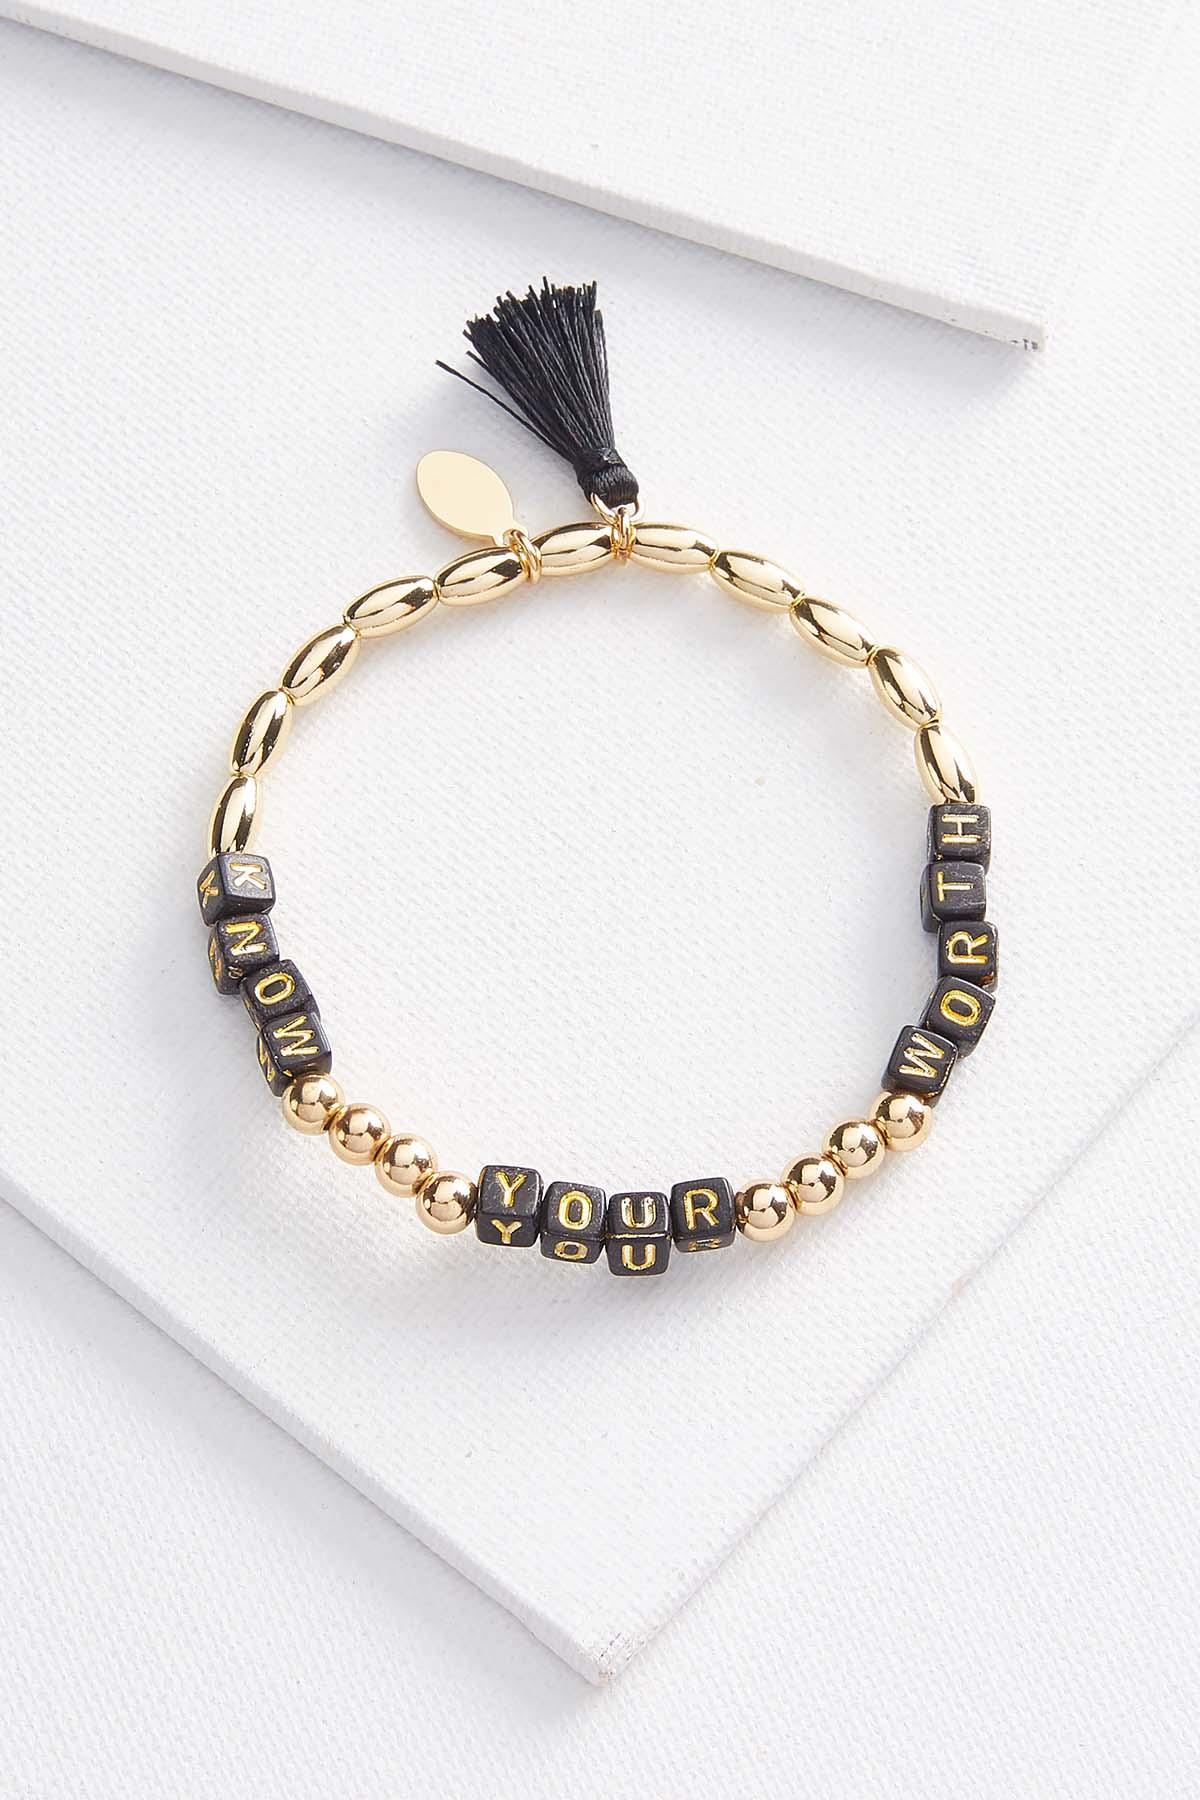 Worth Inspirational Bracelet